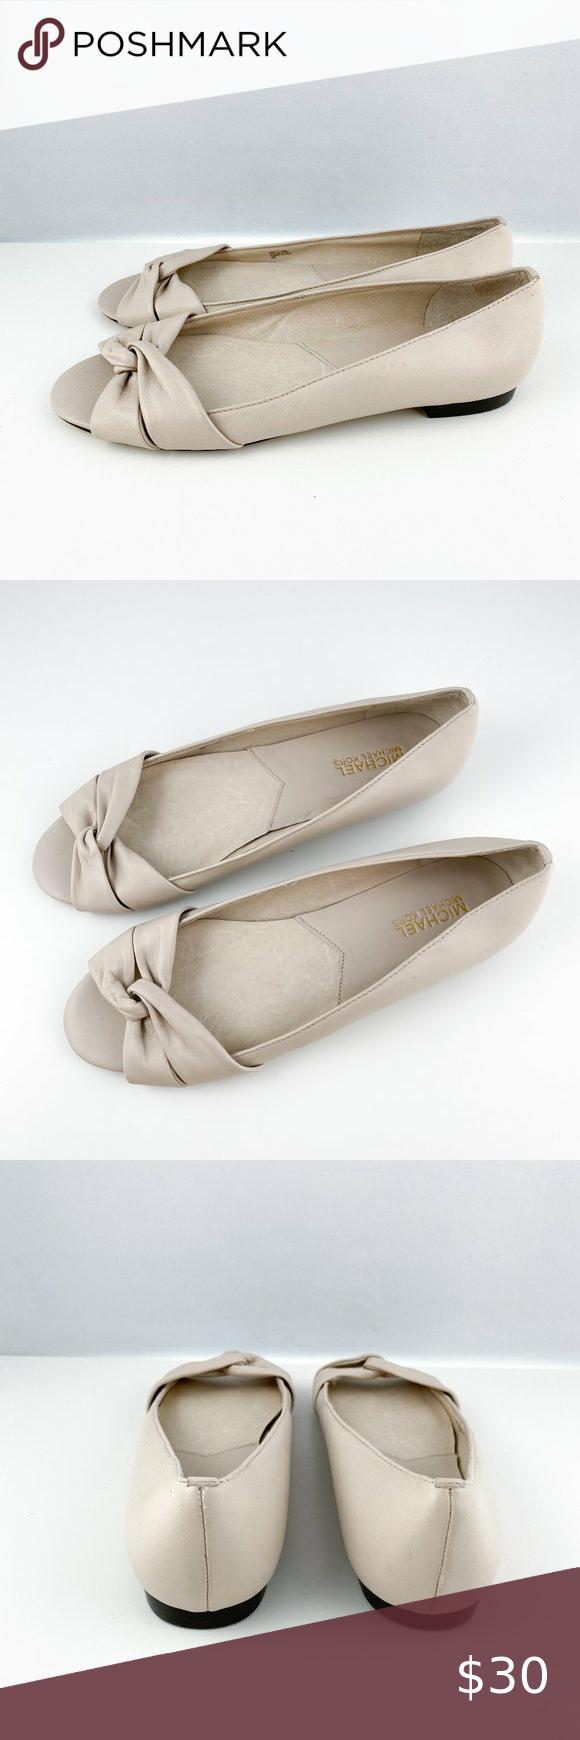 Michael Kors Open Toe Wrap Leather Flats Beige In 2020 Leather Flats Flat Shoes Women Open Toe